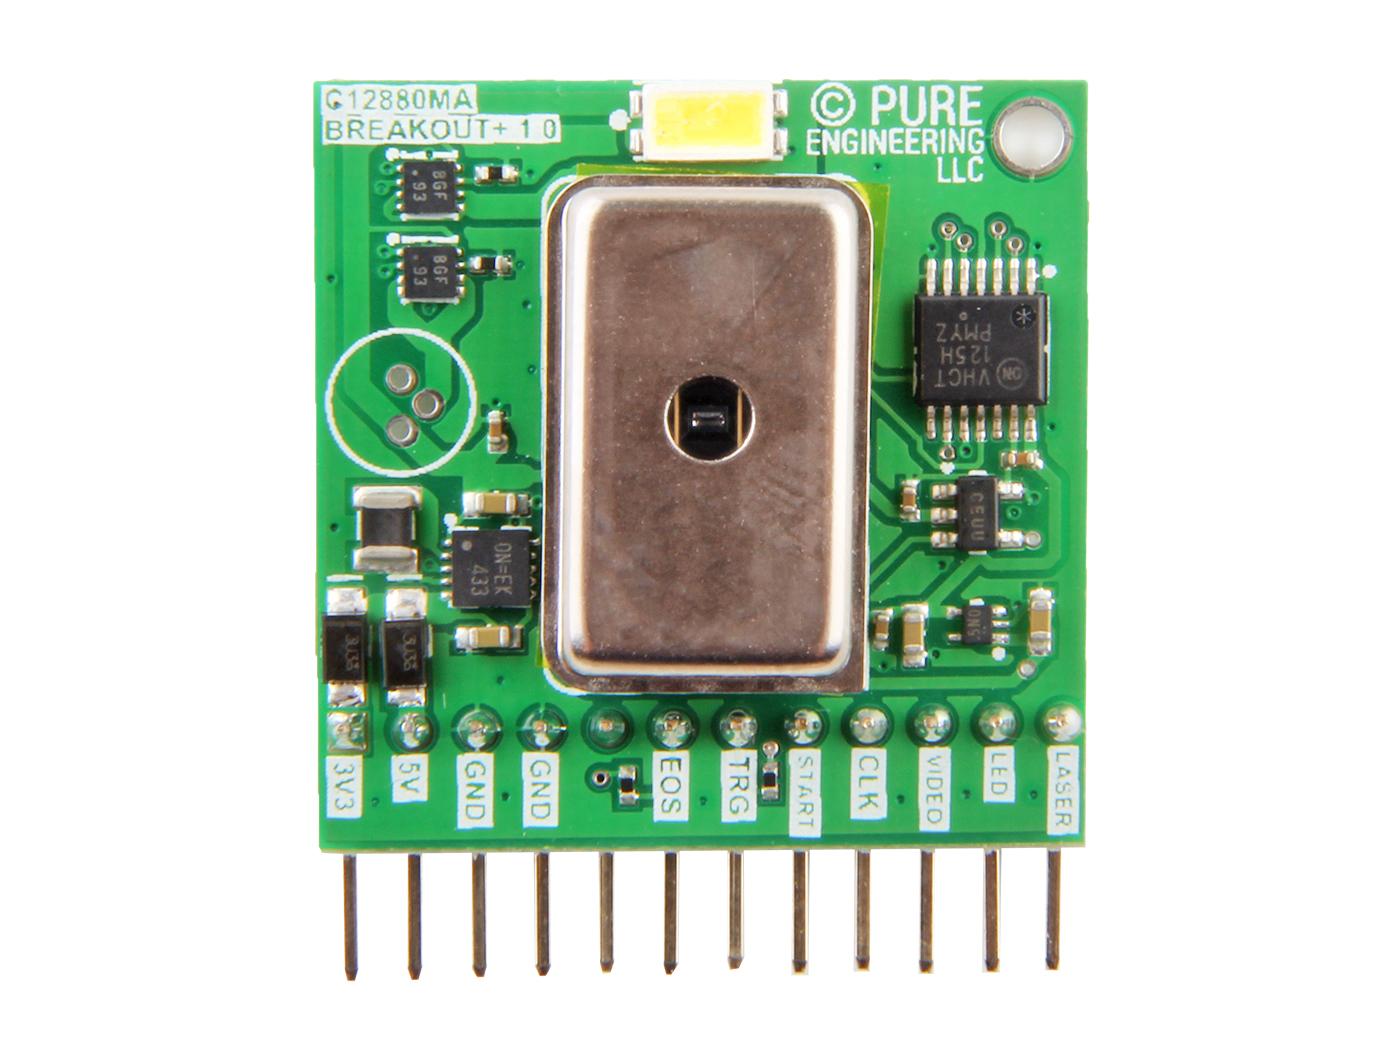 Hamamatsu C12880MA MEMS u-Spectrometer and Breakout Board